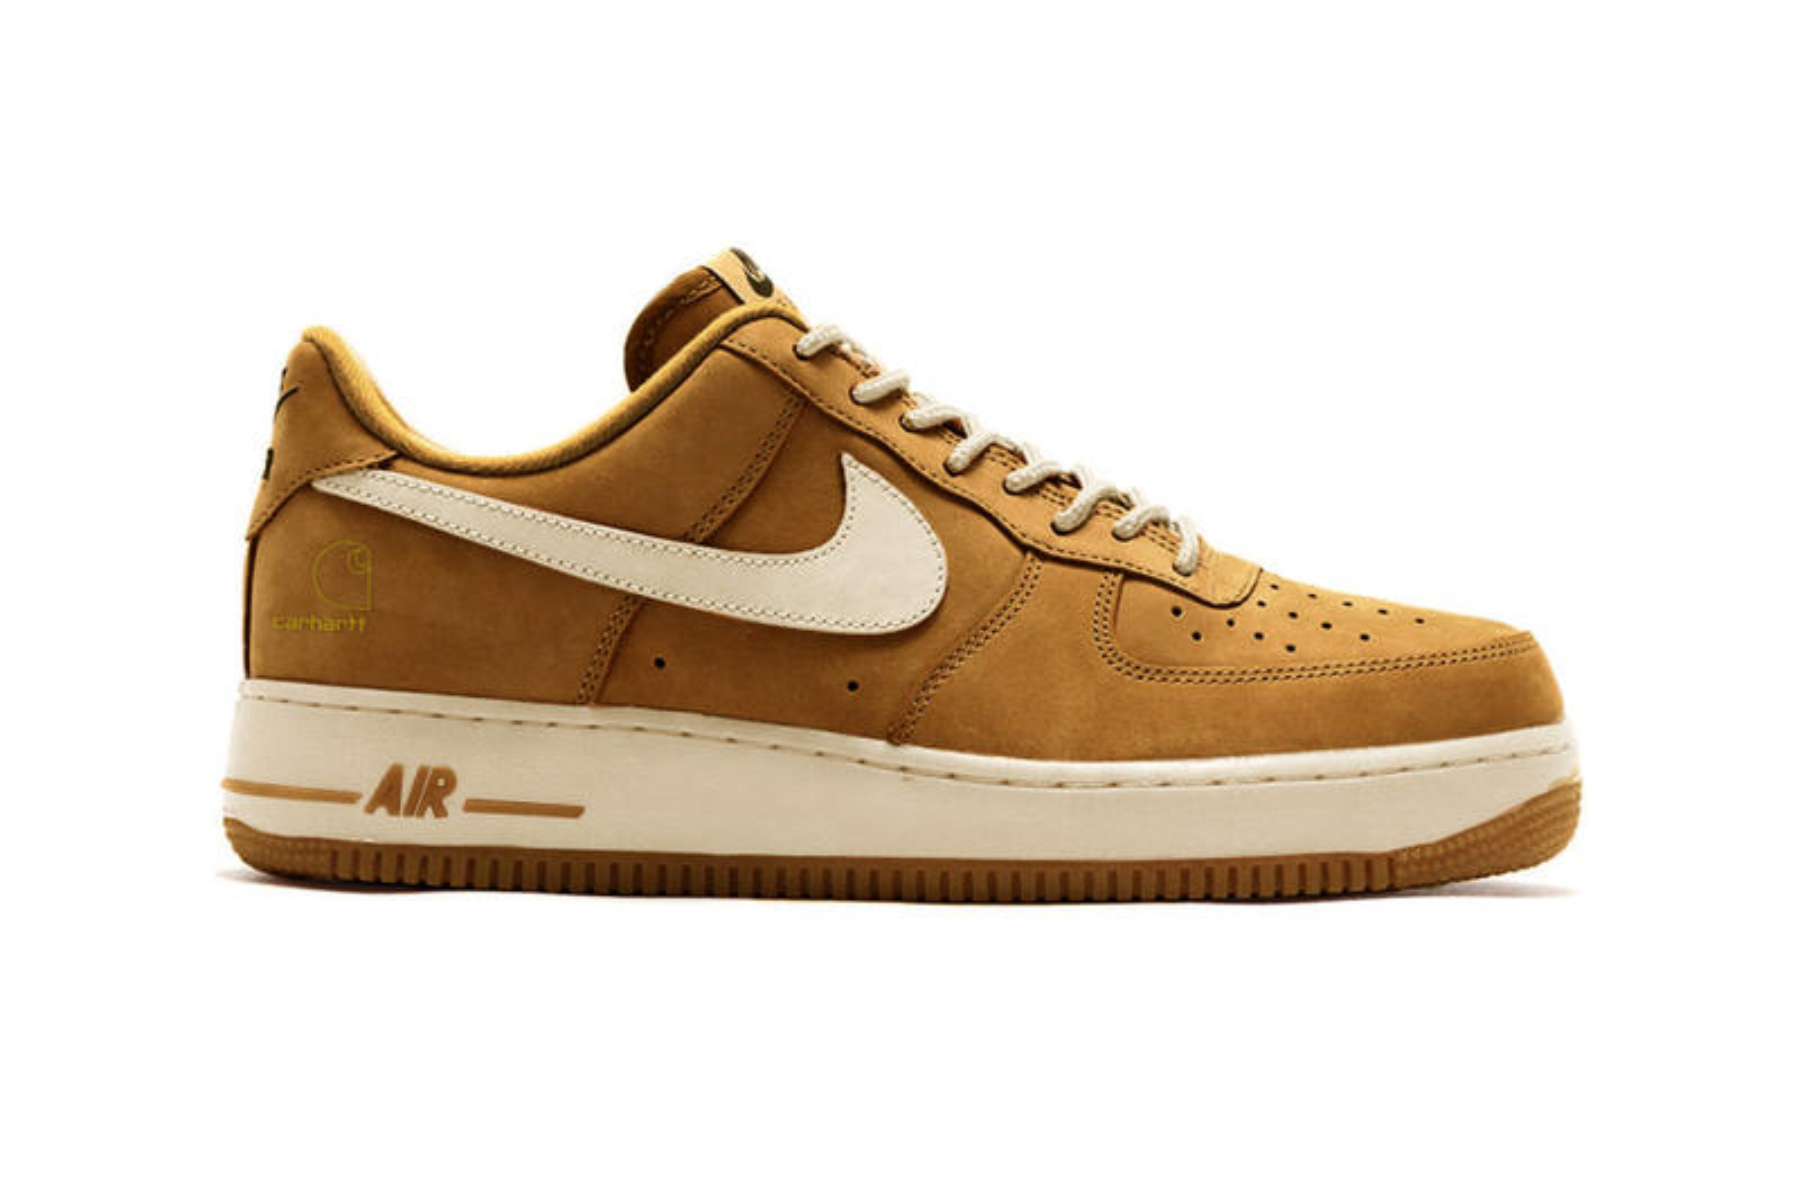 Carhartt Wip X Nike Air Force 1 Collab Rumor Hypebeast